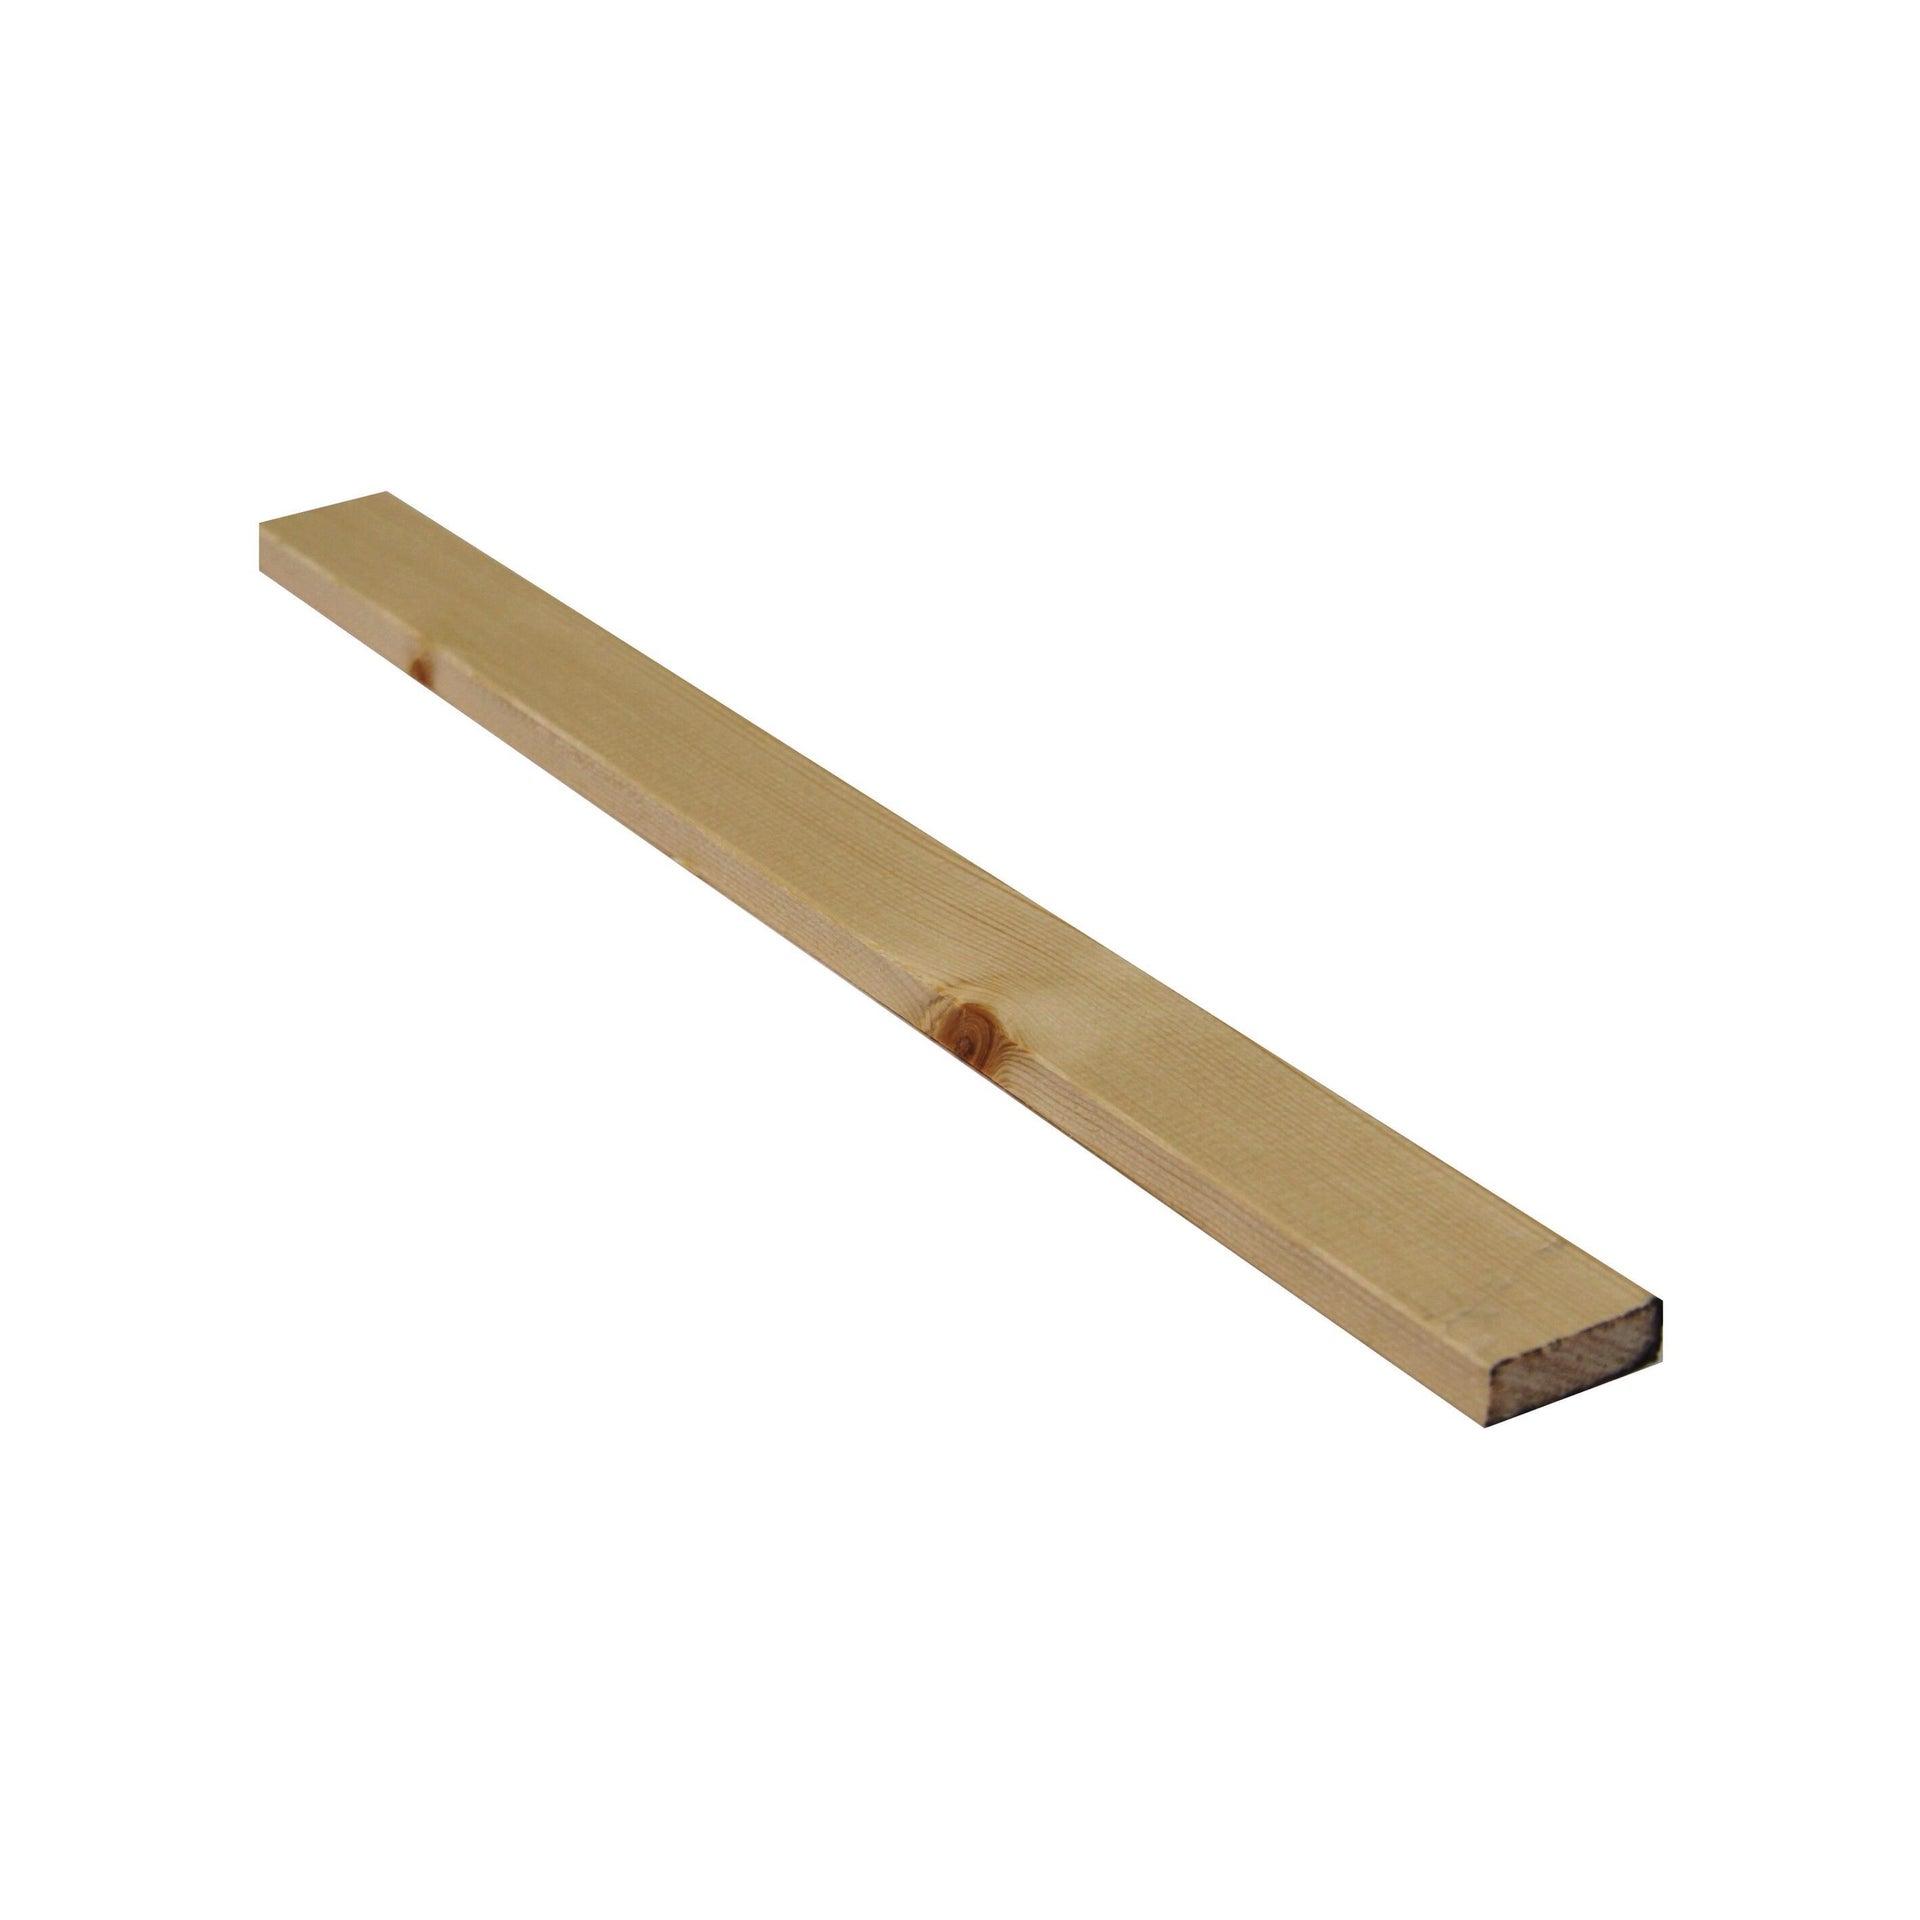 Listello piallato abete 2 m x 30 mm, Sp 9 mm